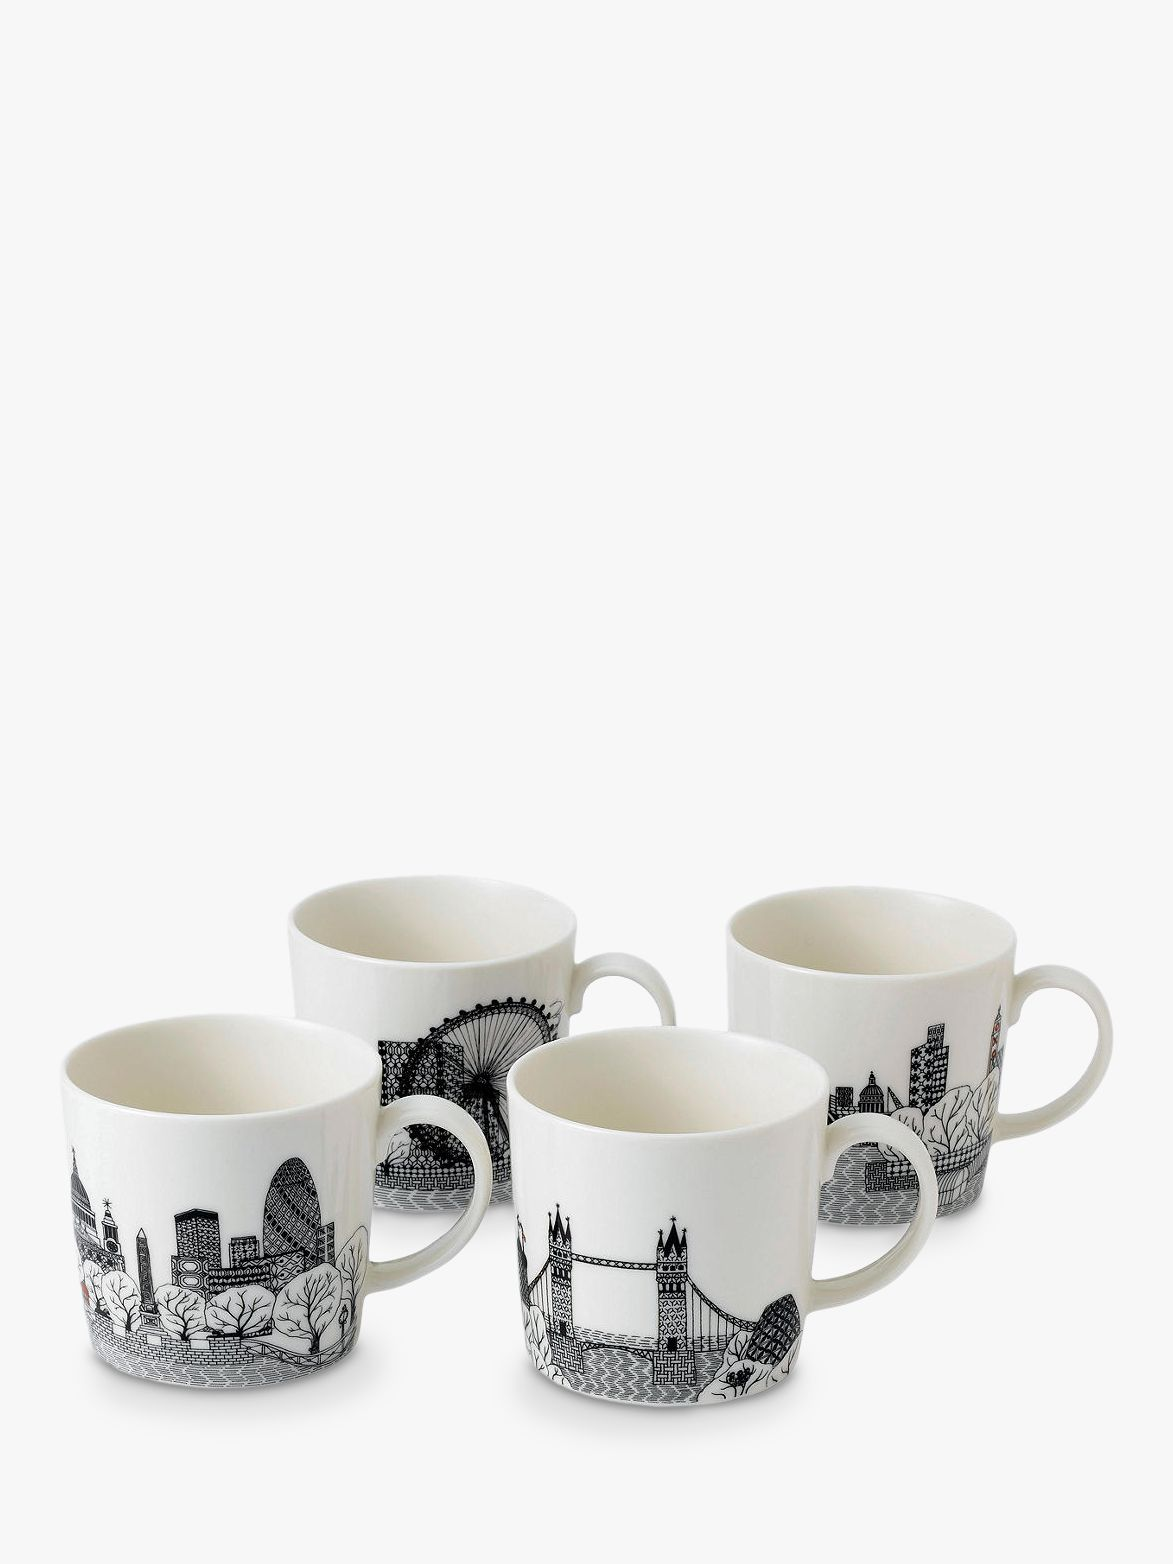 Royal Doulton Royal Doulton Charlene Mullen London Calling Mugs, Set of 4, 400ml, Black/White